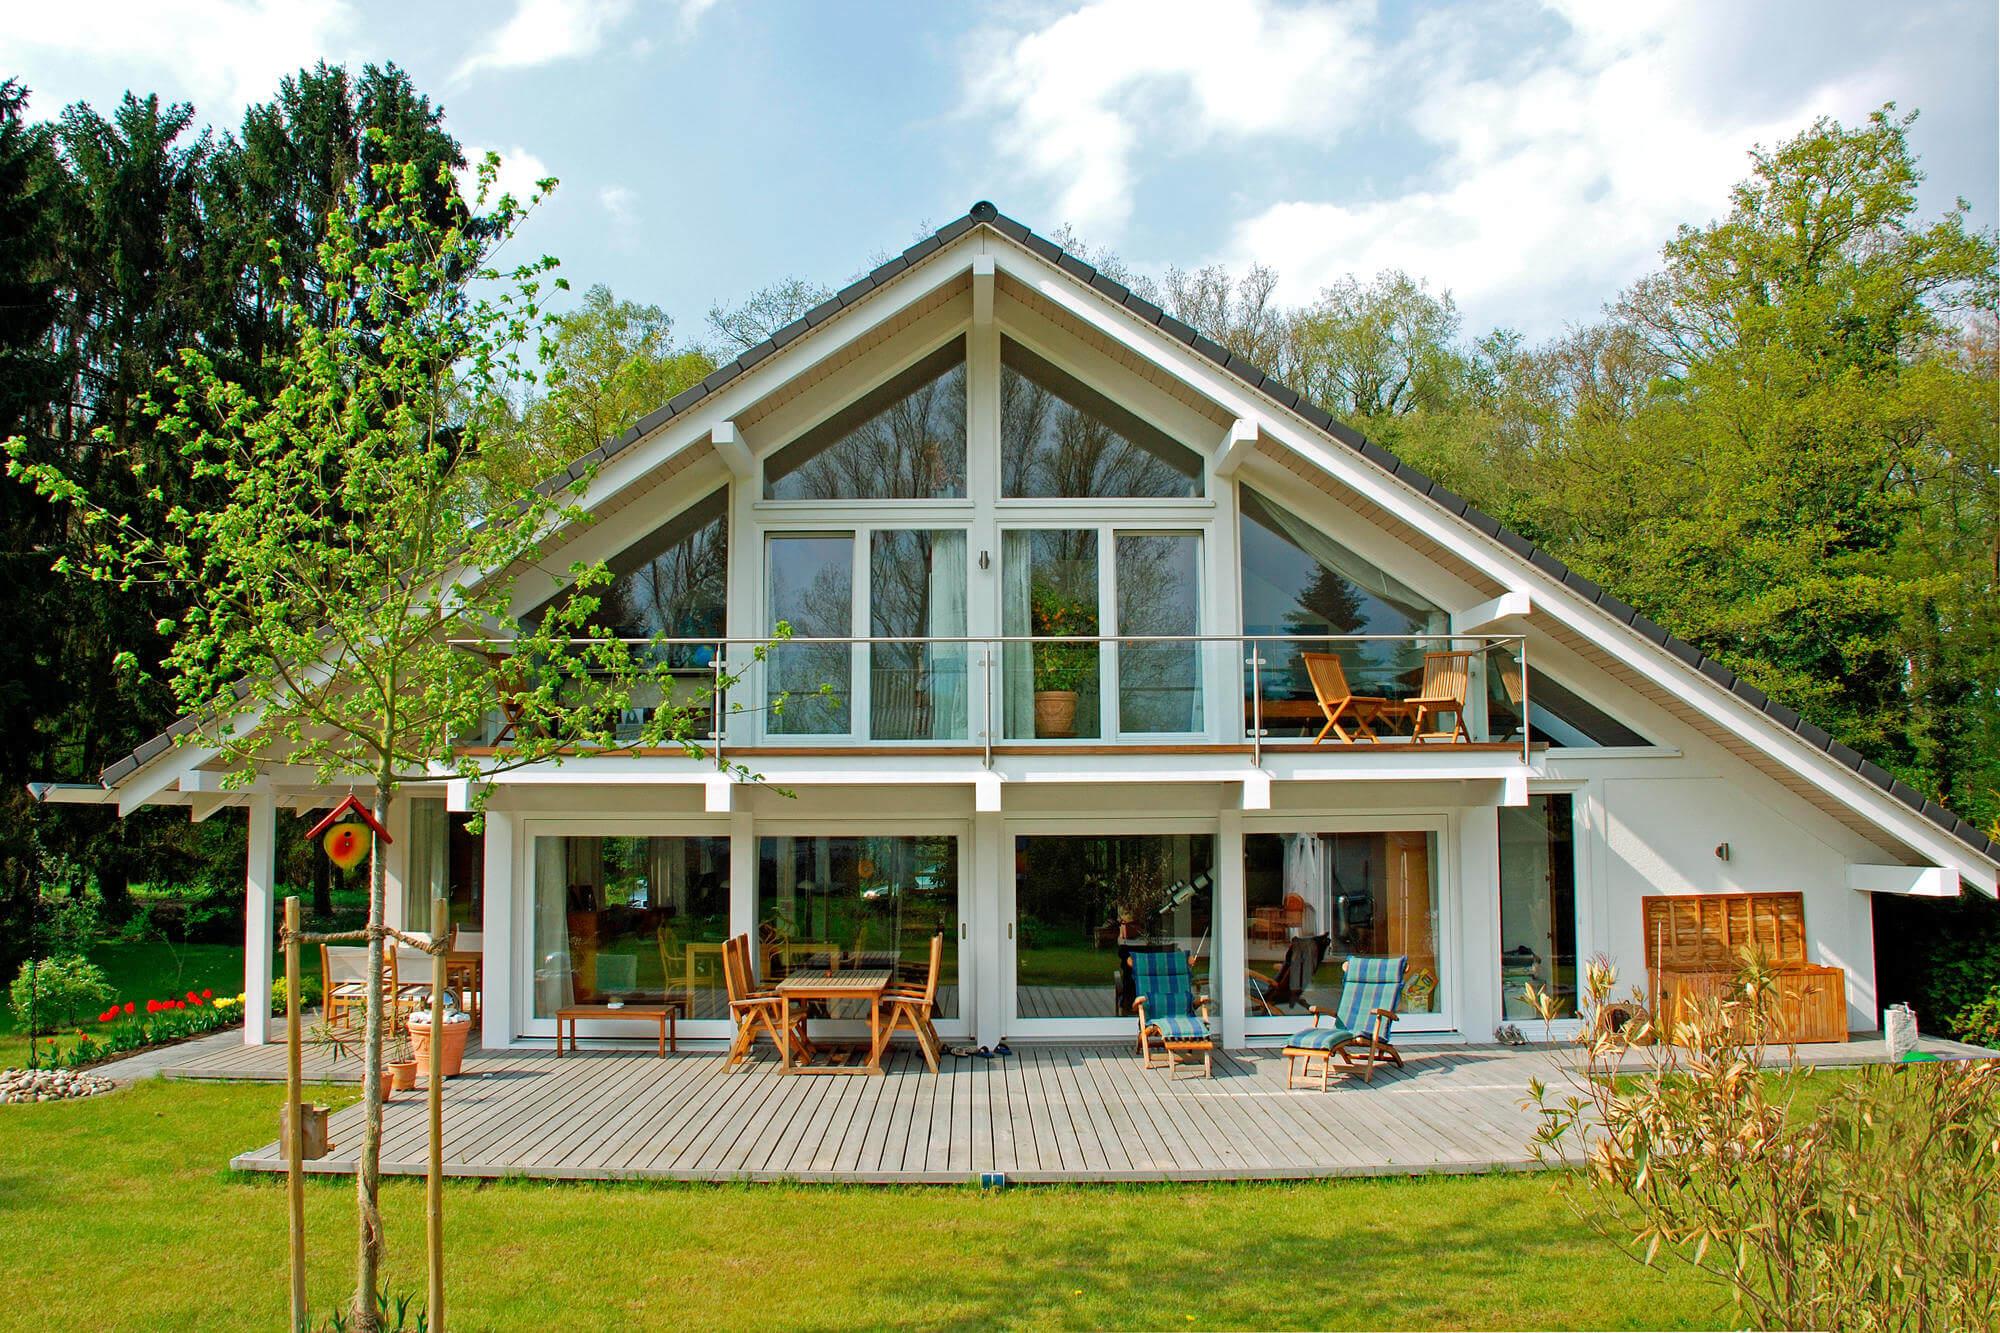 Fachwerk fertighaus modern holzskeletthaus kd haus for Fachwerkhaus modern